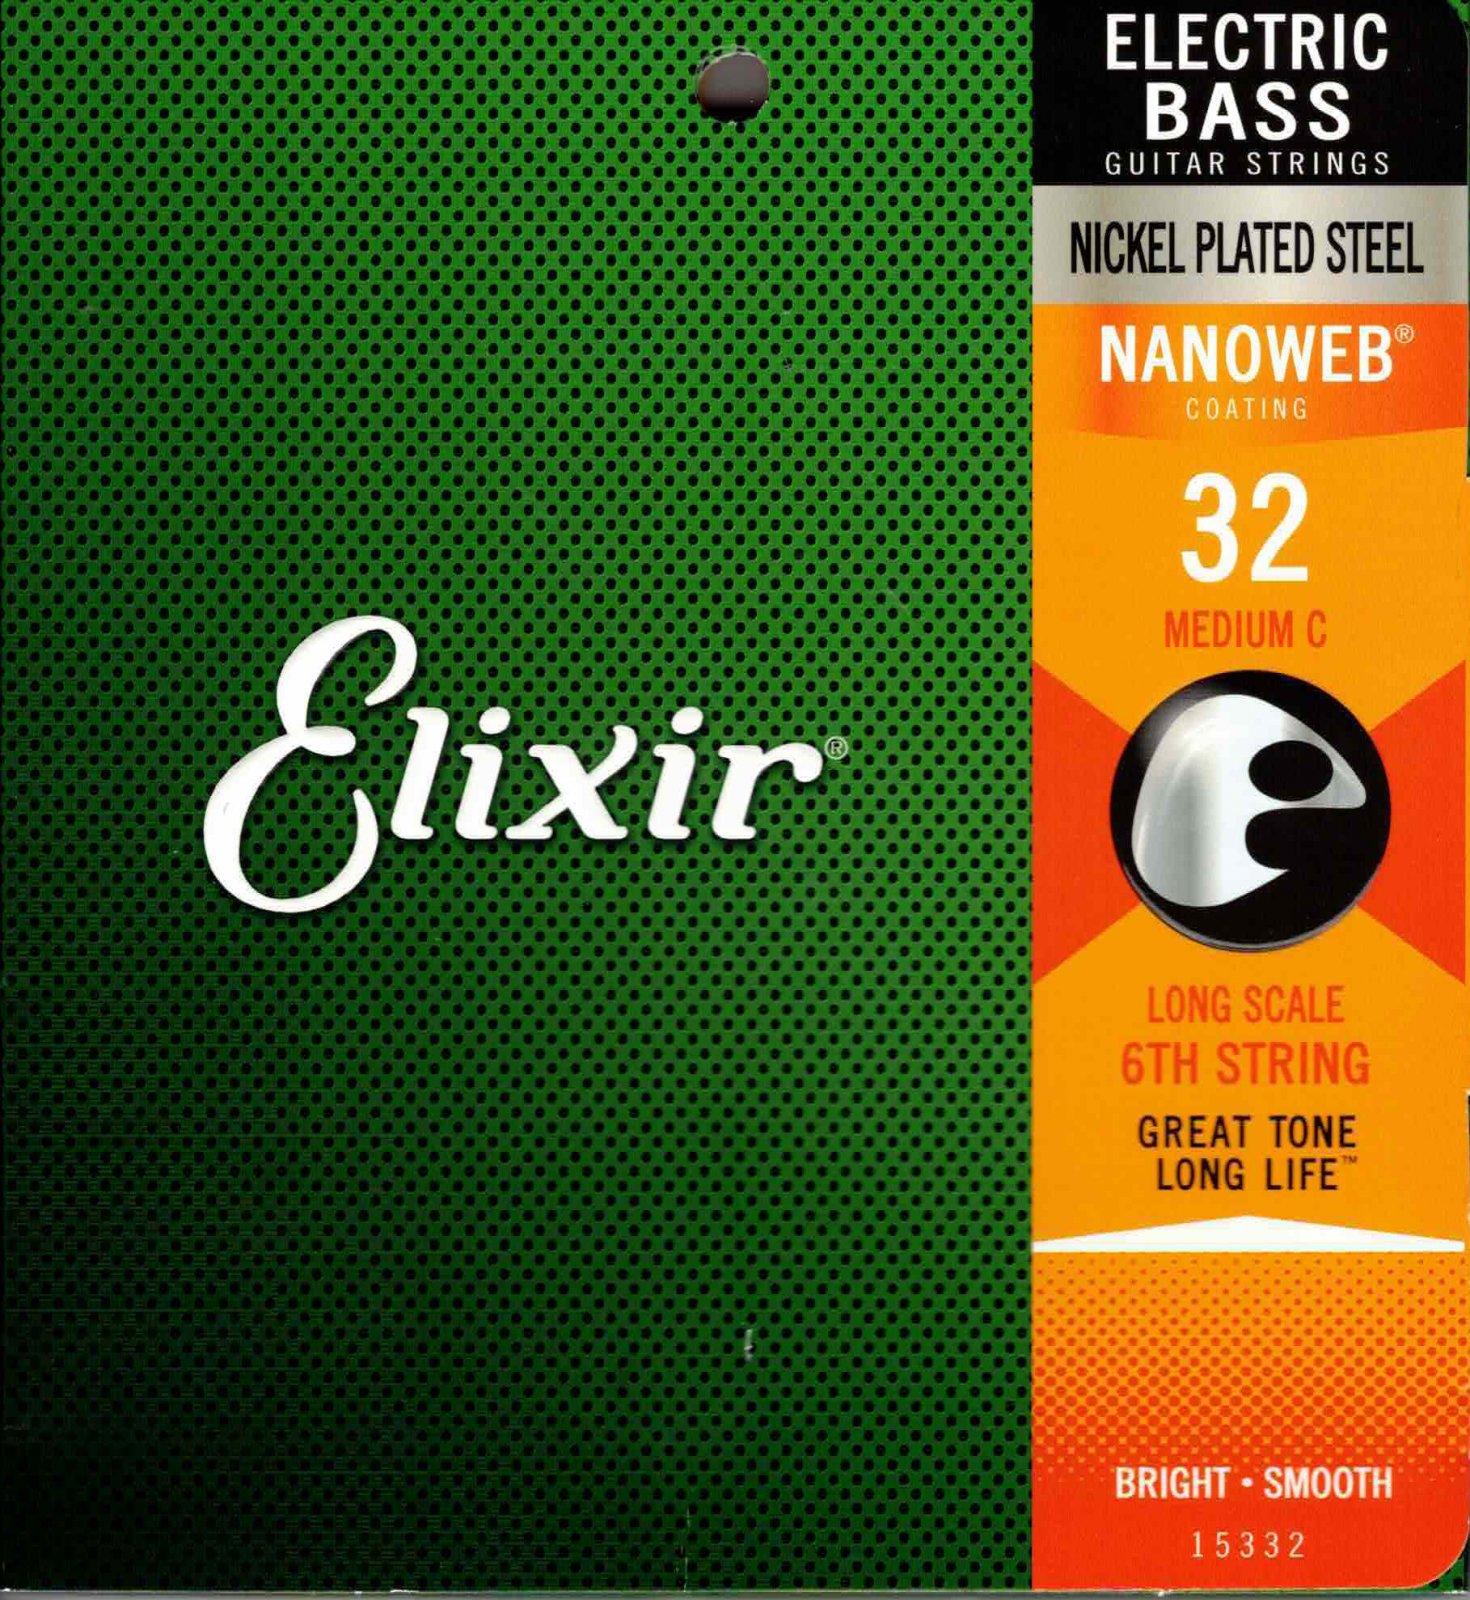 Elixir 15332 Nanoweb 32 Gauge Single Bass 6th String